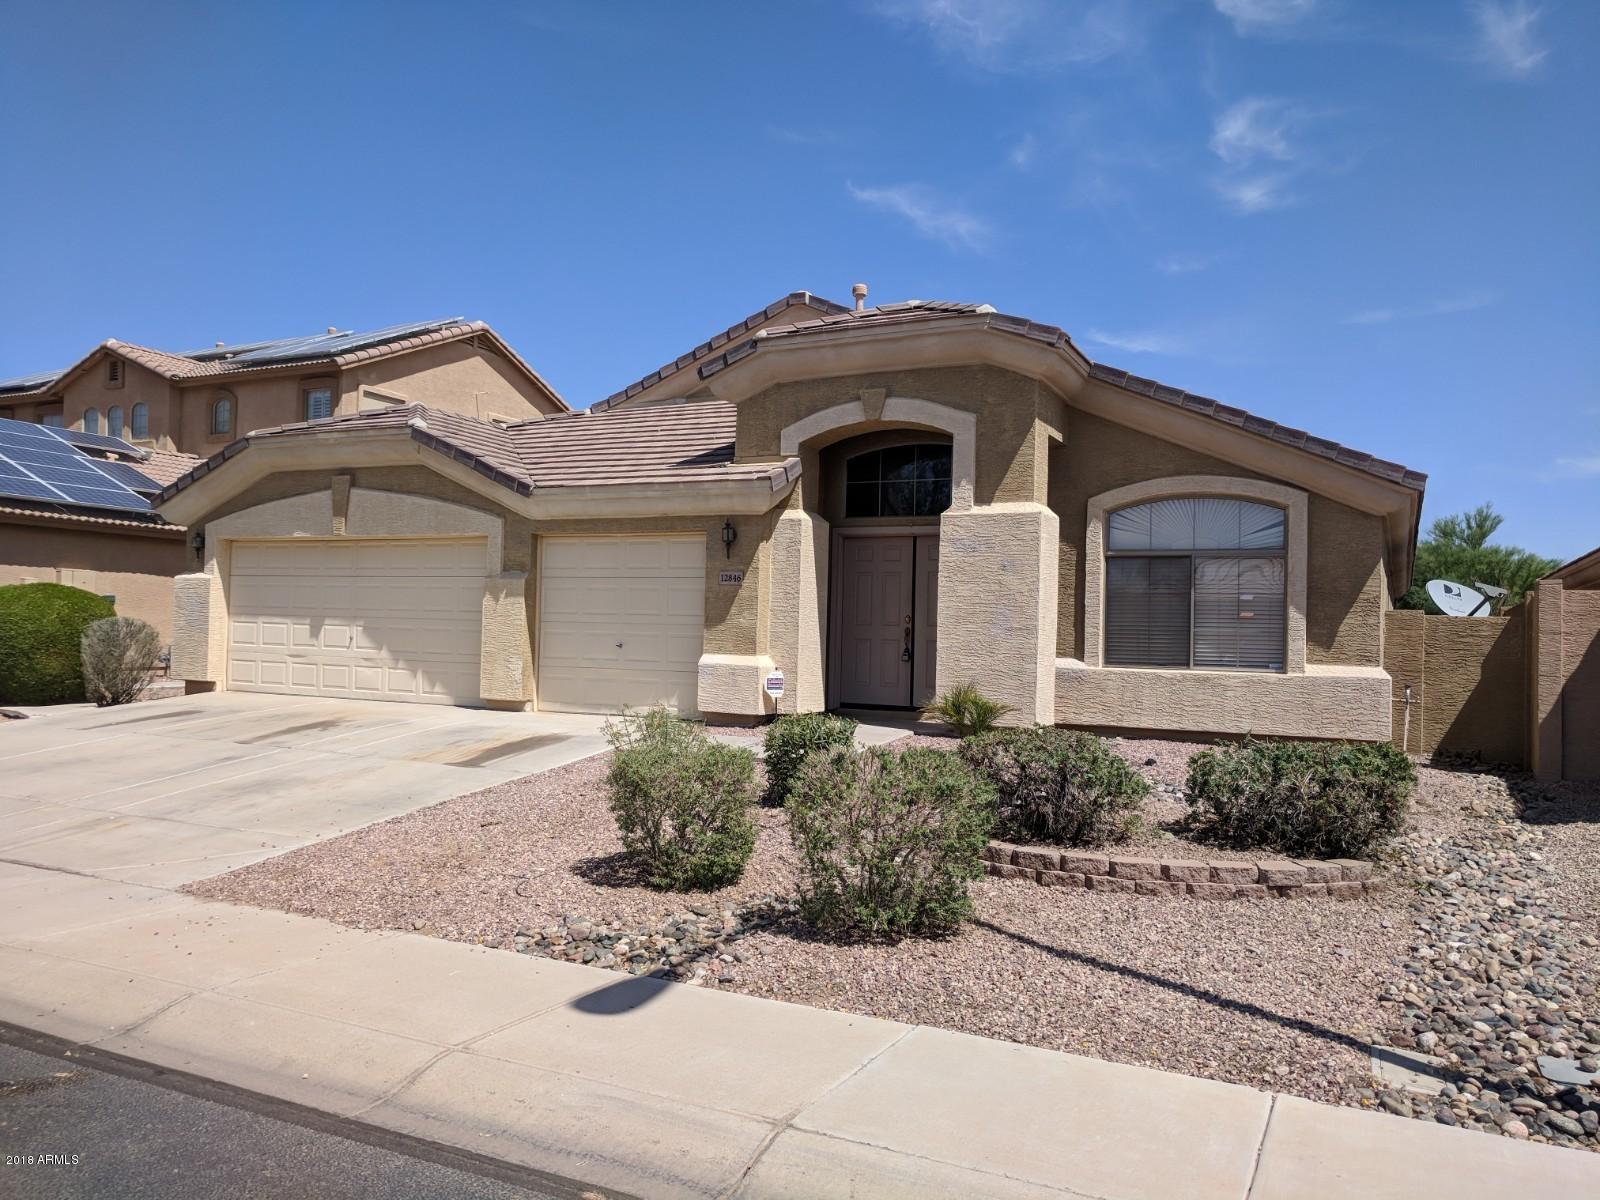 Photo of 12846 W ASTER Drive, El Mirage, AZ 85335